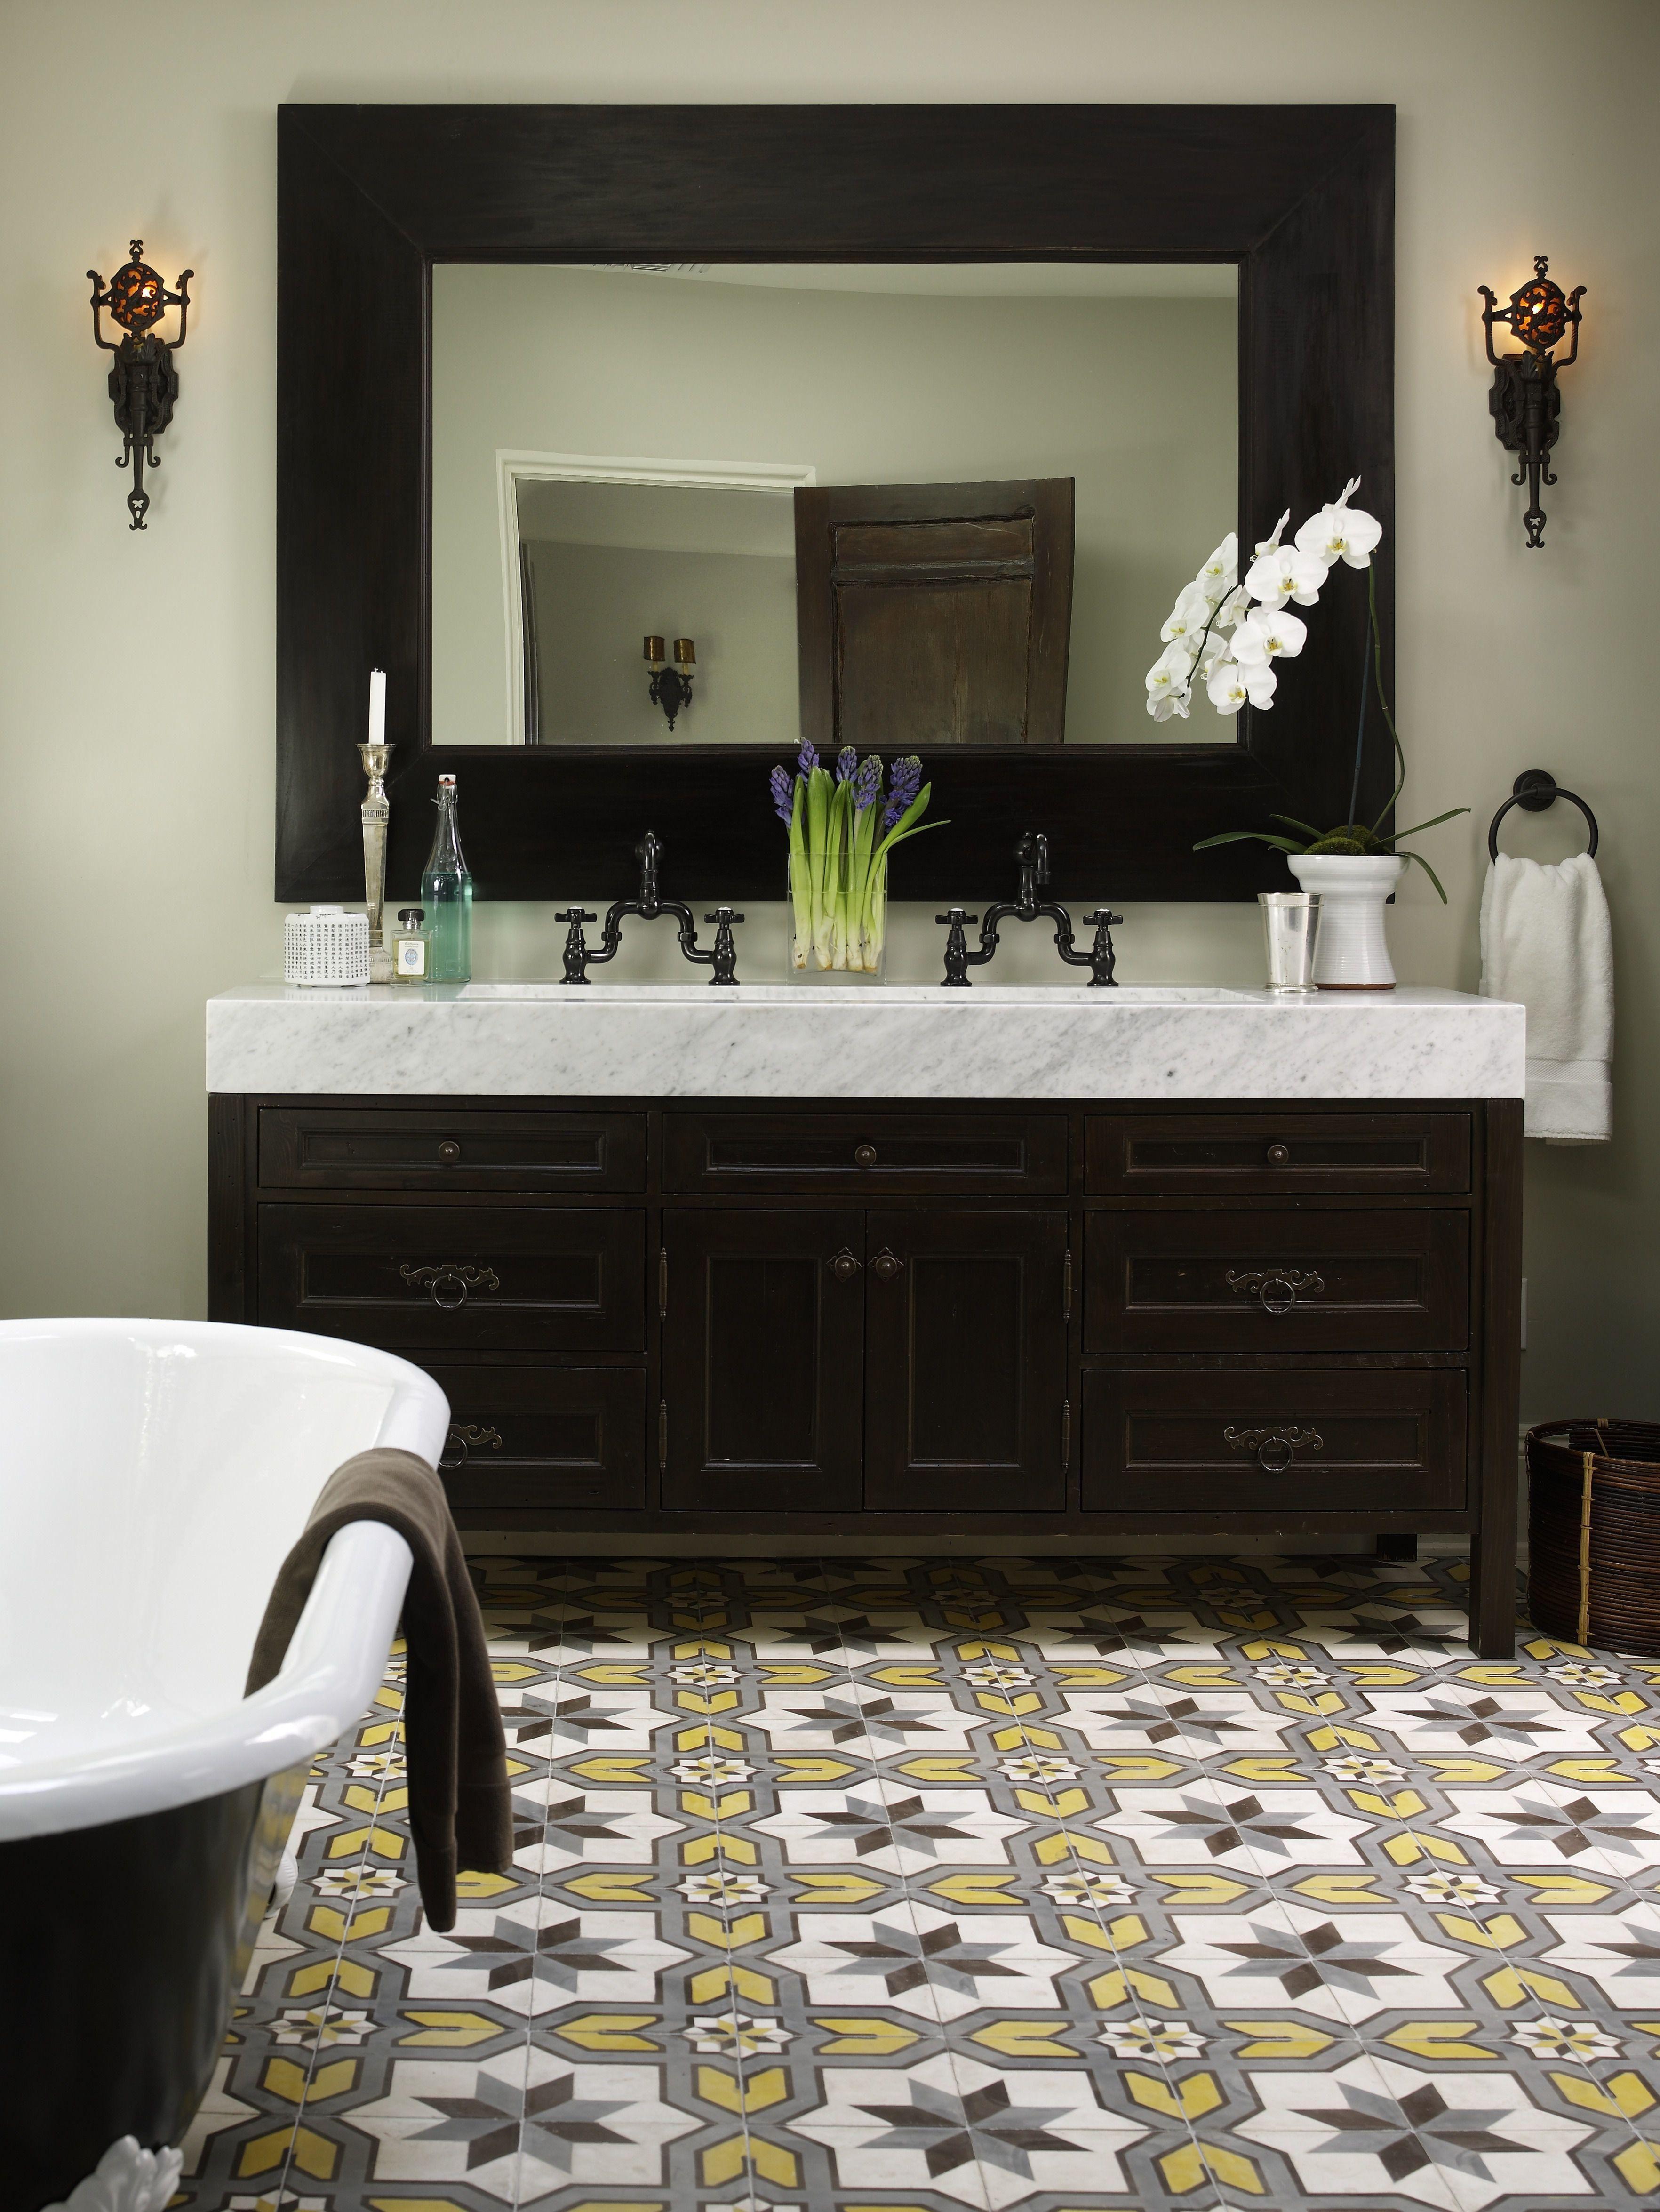 Charismatic Bathroom Tiles Design In Kerala in 2020 ...